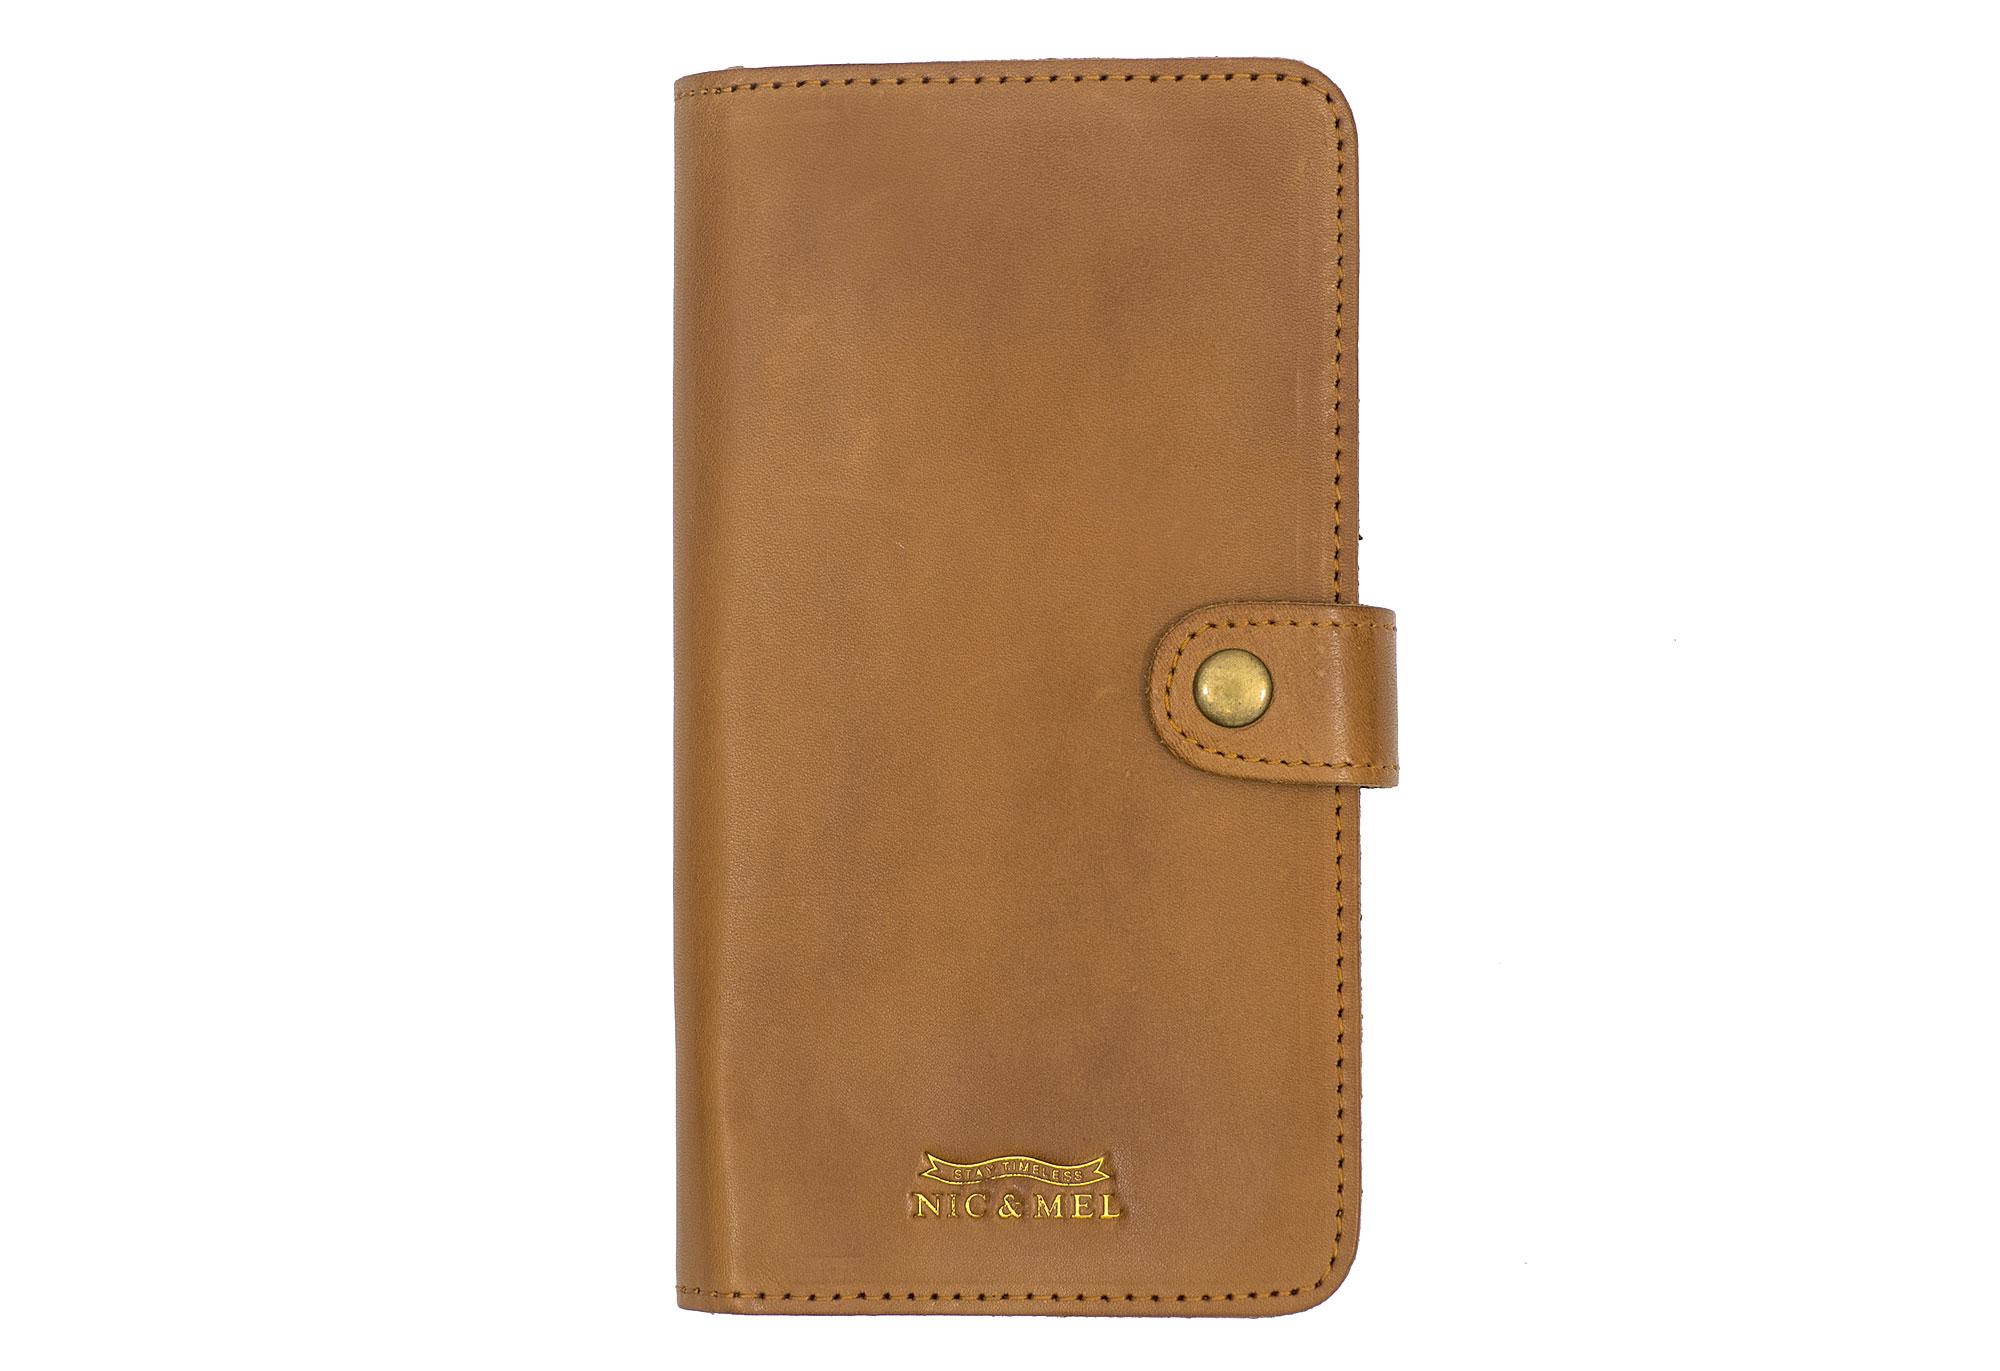 ANDREW BOOKCASE <br>Cognac Leather <br>iPhone 6 PLUS/7 PLUS